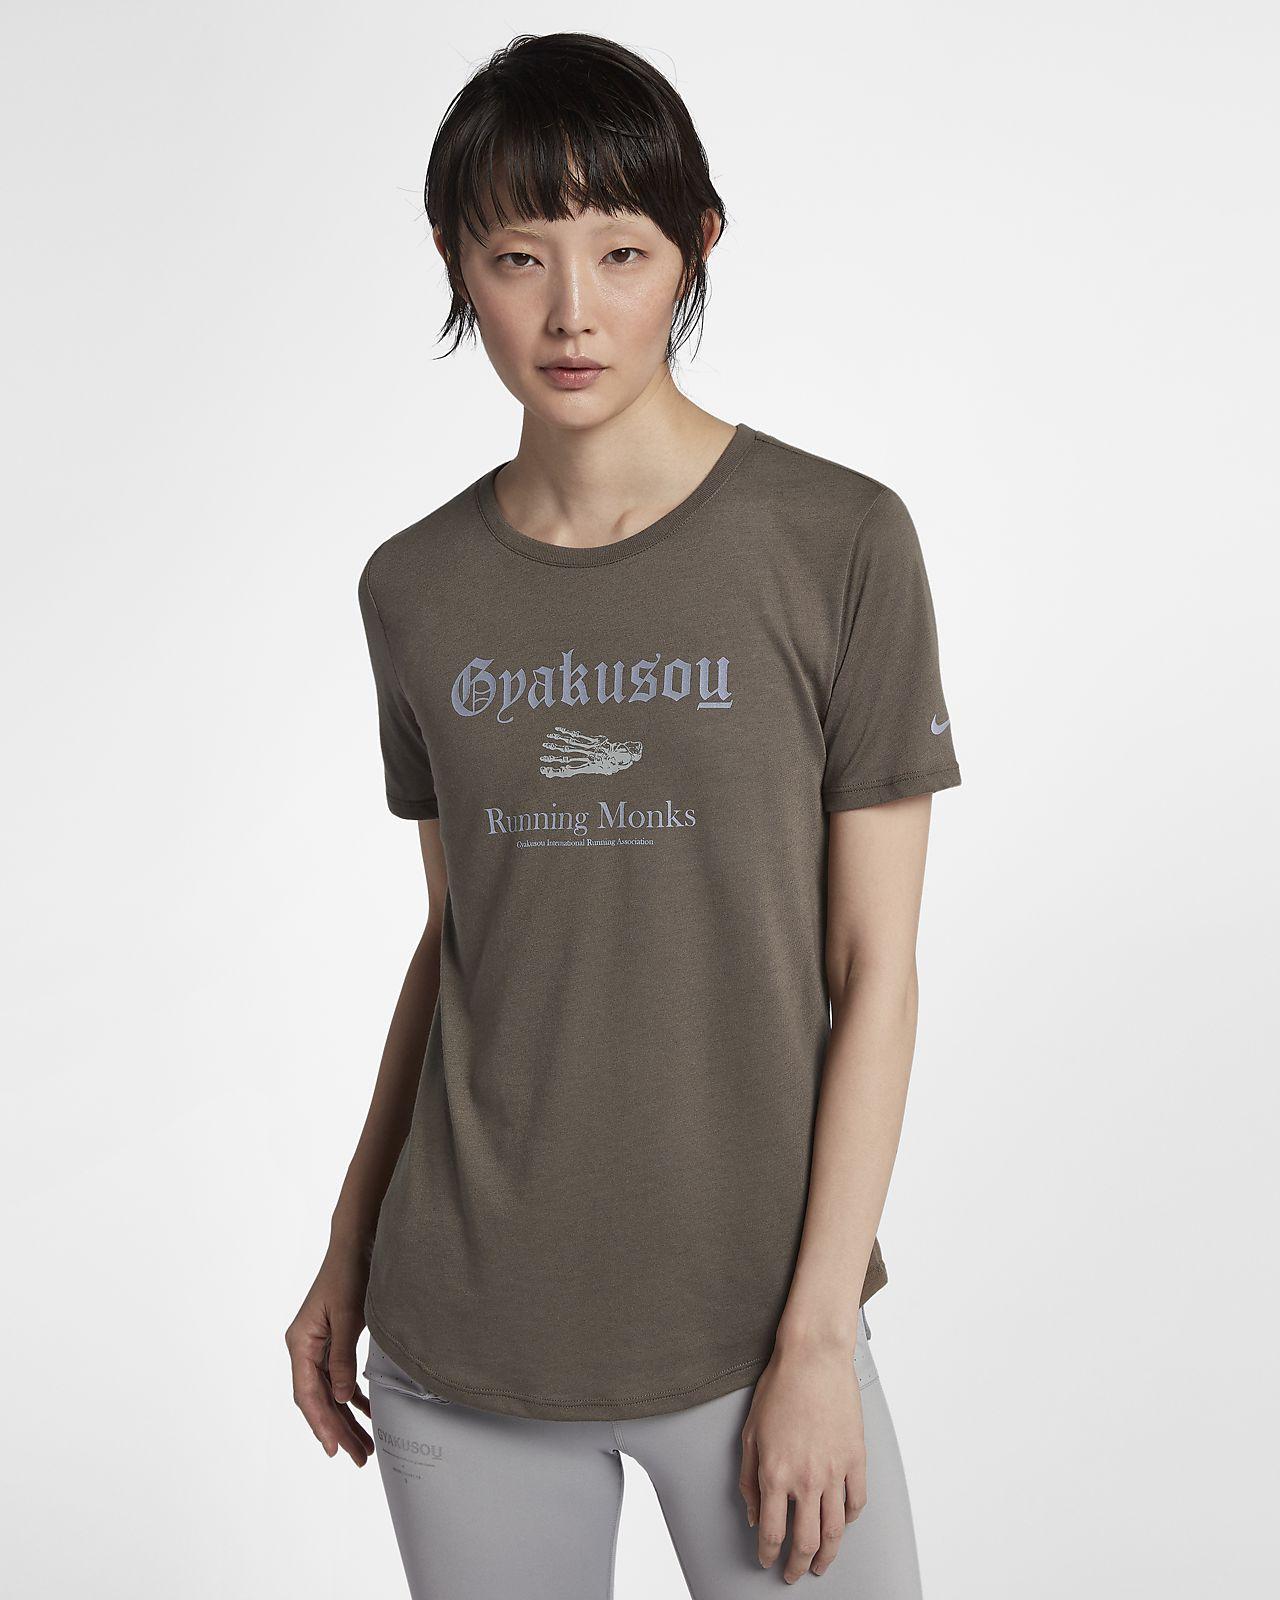 NikeLab Gyakusou Dri FIT Women's Short Sleeve T Shirt